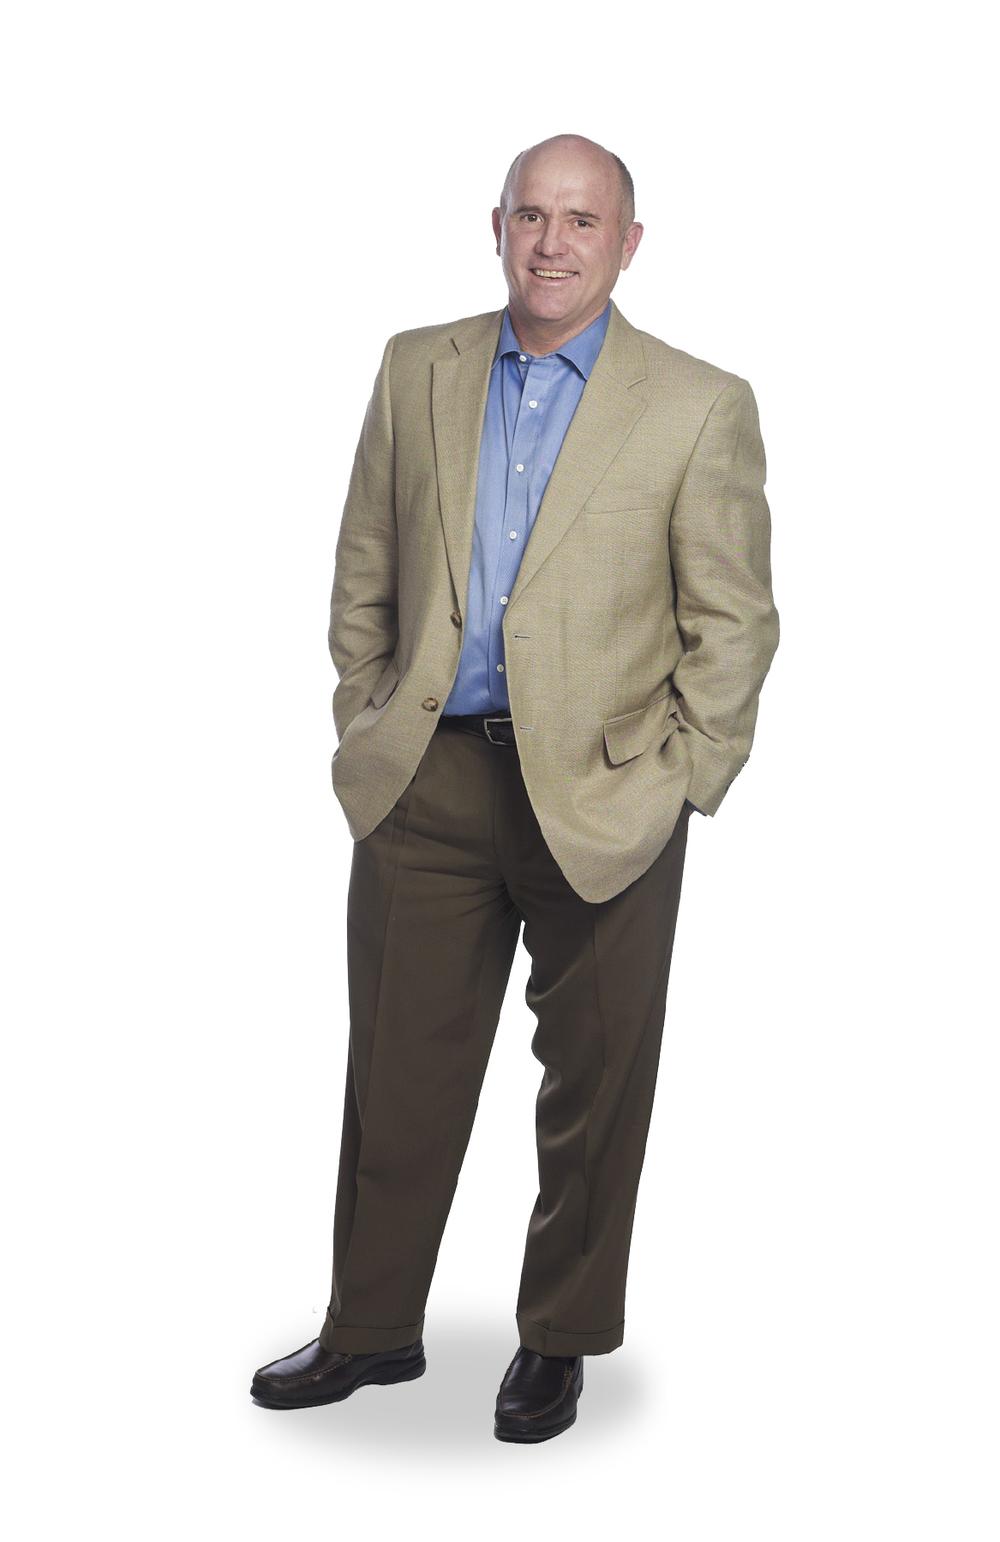 Ken McLagan,Director of Finance & Administration